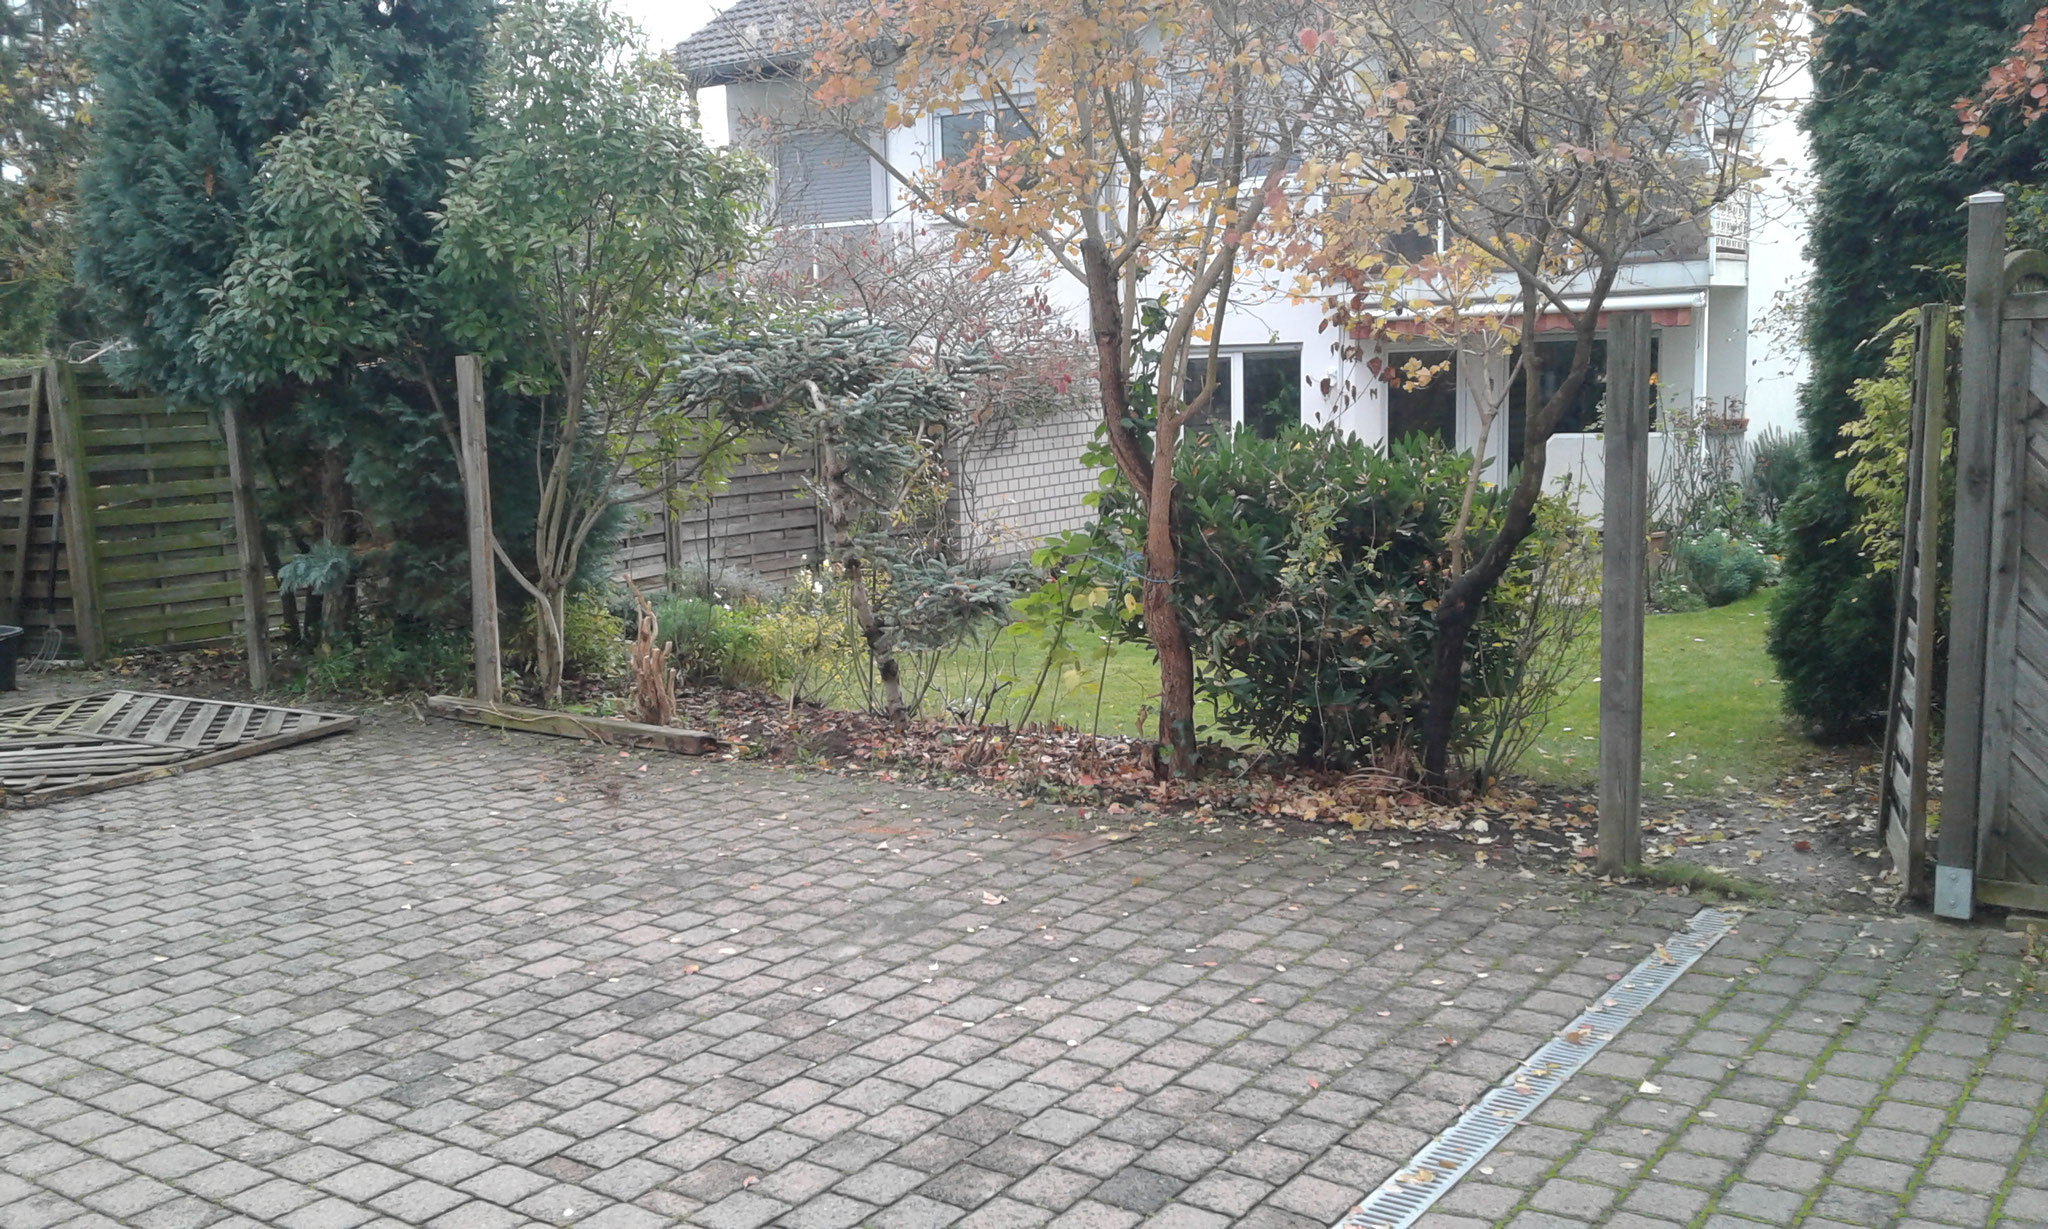 Zaunbauprojekt Mainz - Abbau